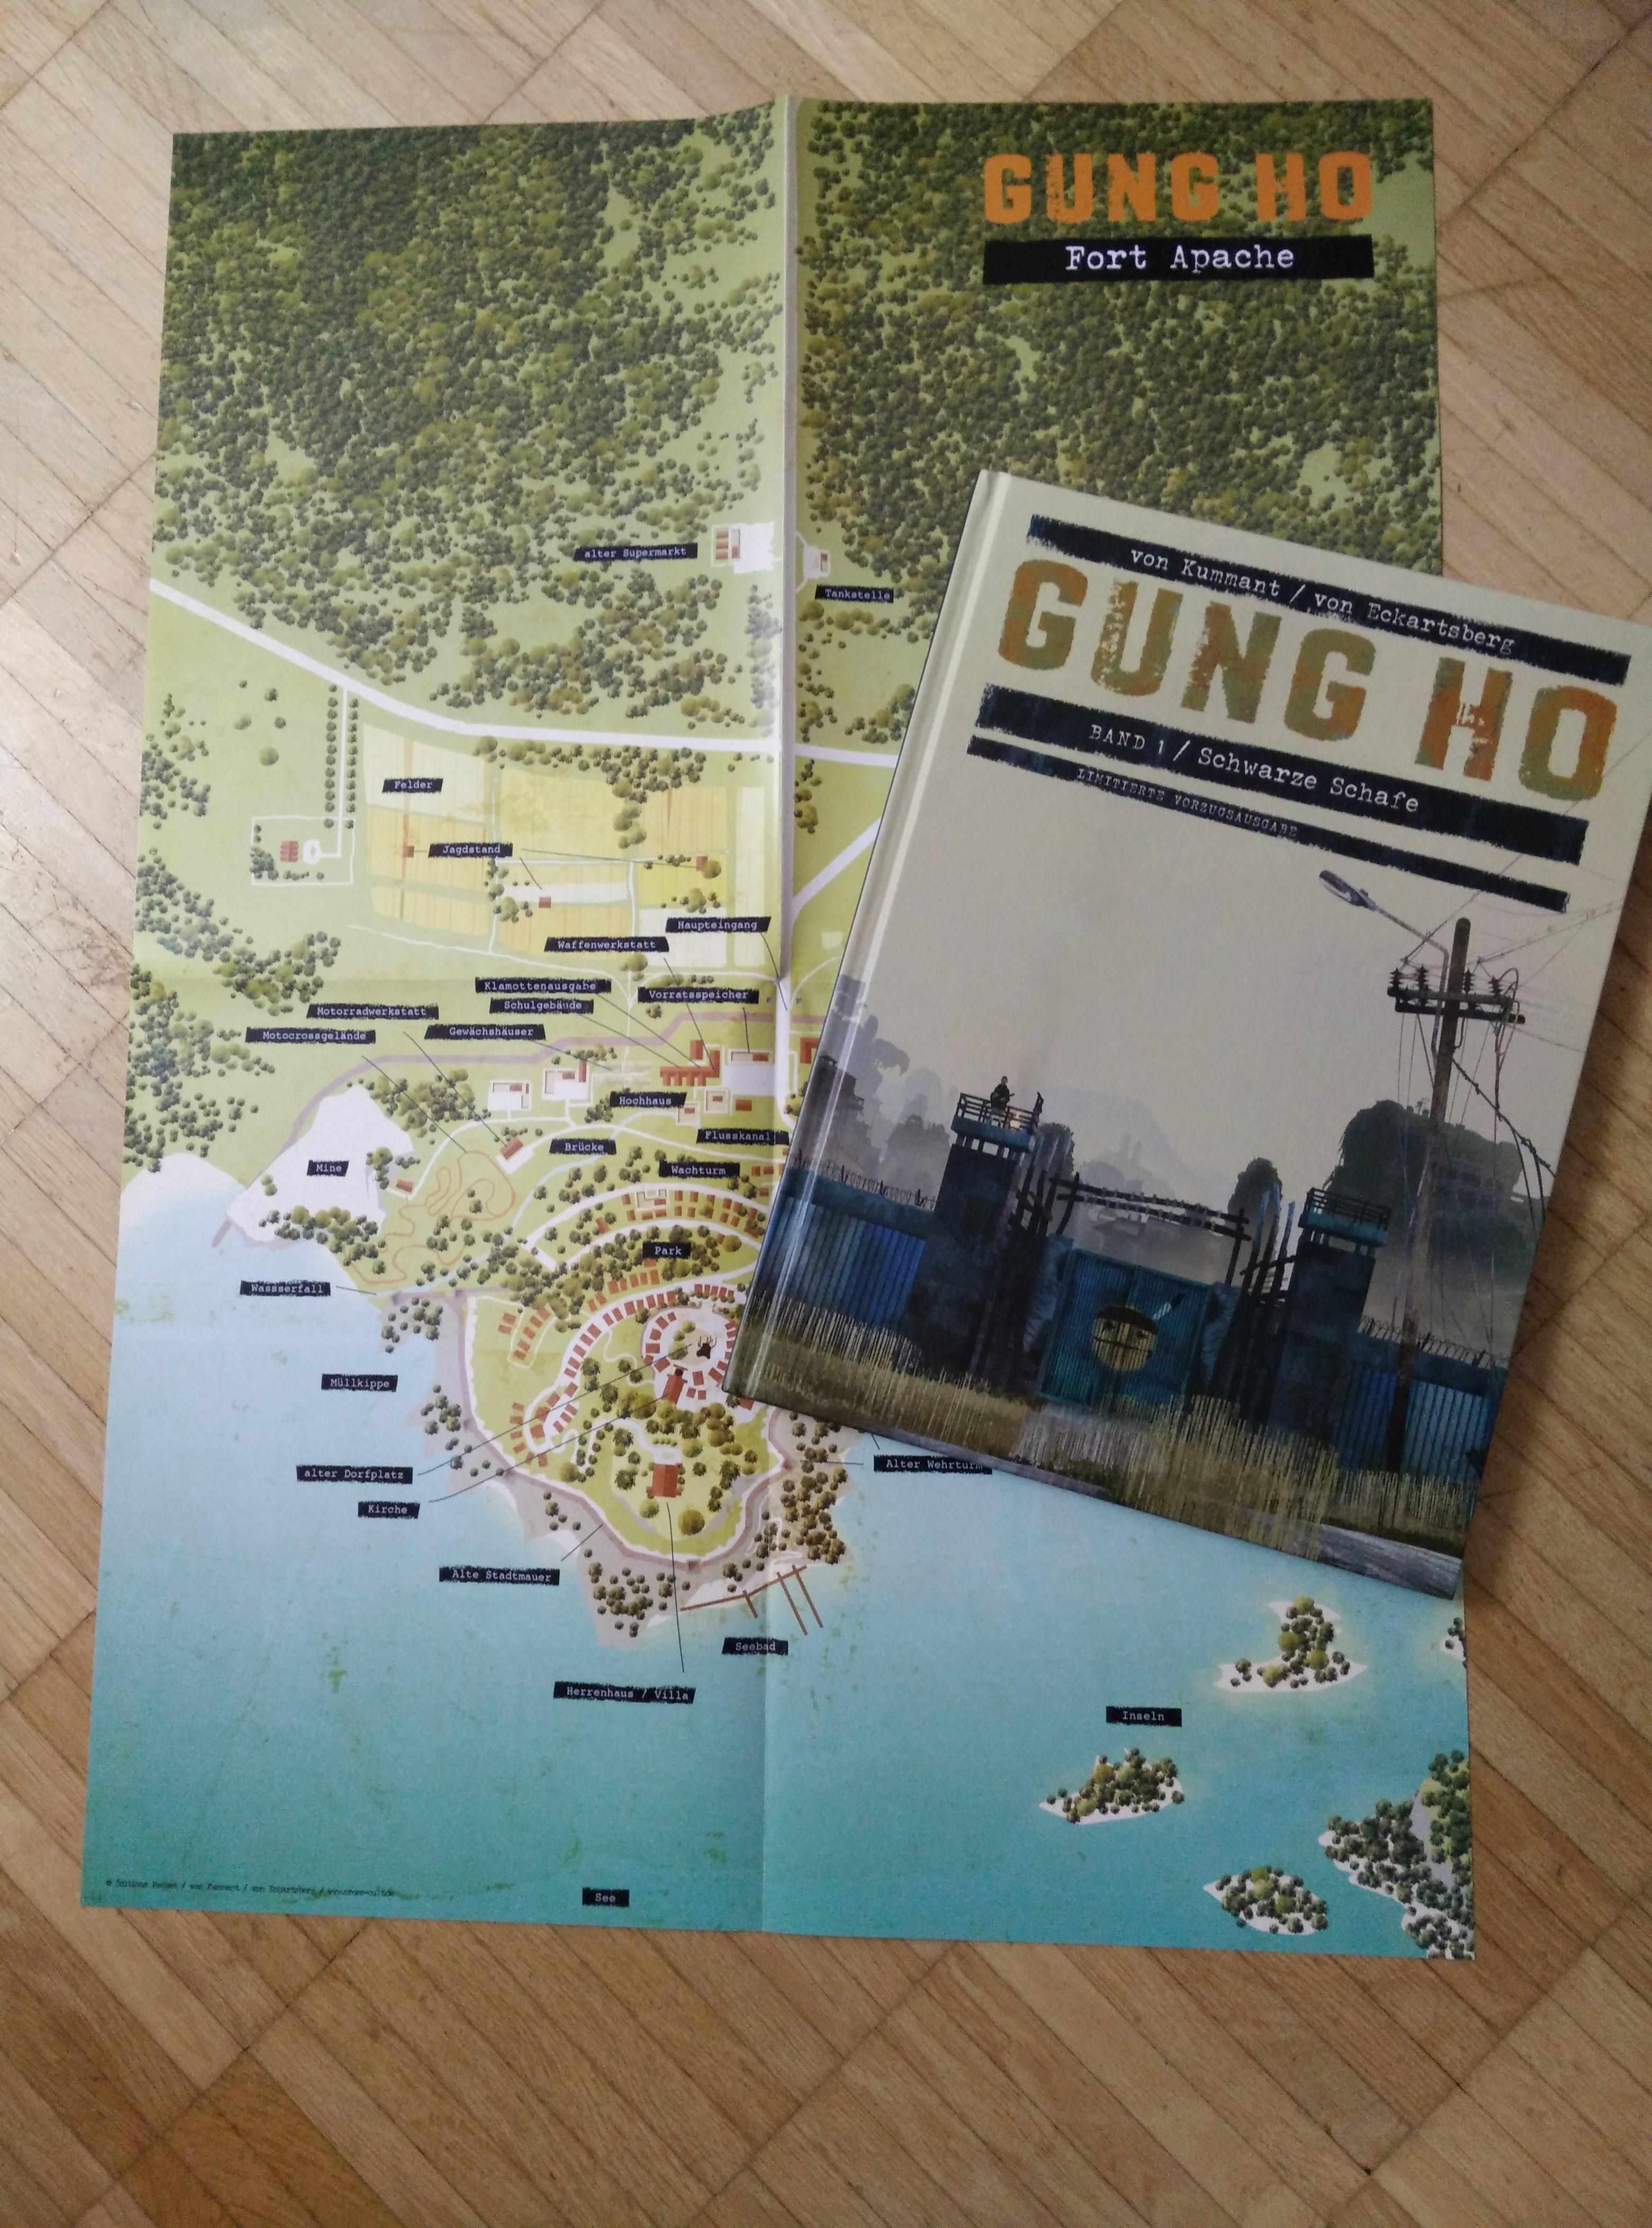 Gund Ho (Image: obskures.de)